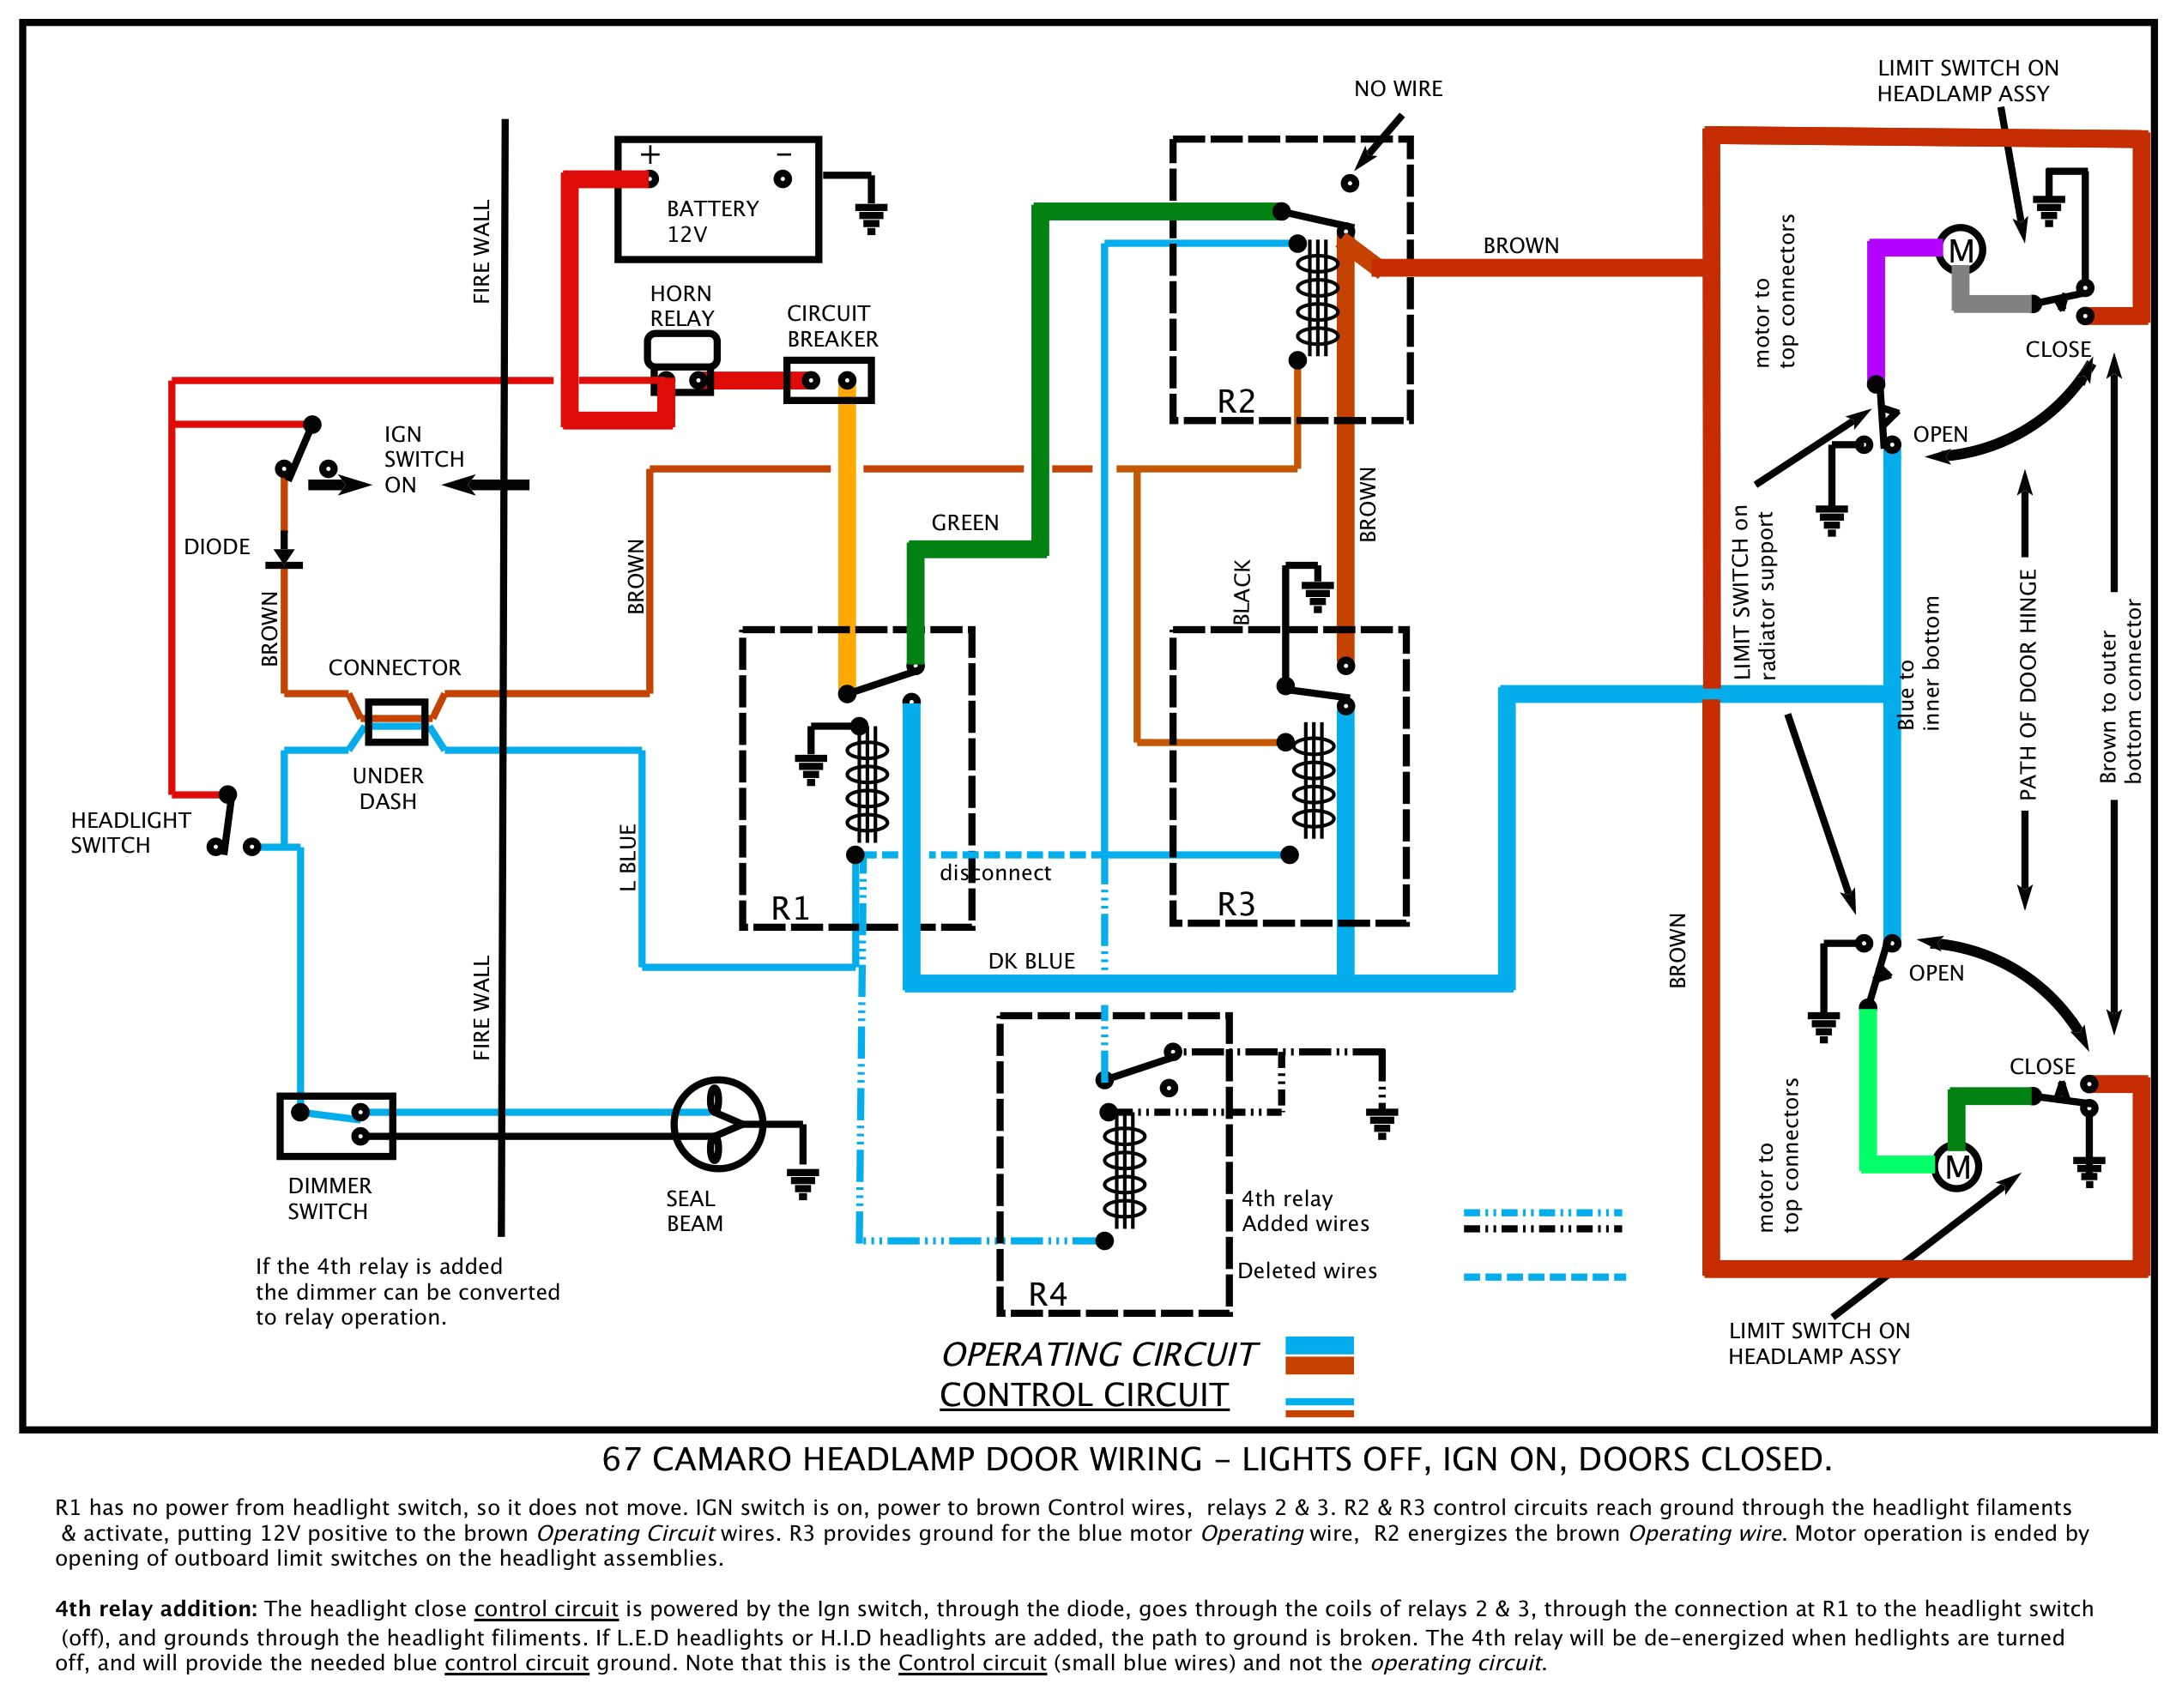 1969 camaro wiring diagram autocardesign. Black Bedroom Furniture Sets. Home Design Ideas